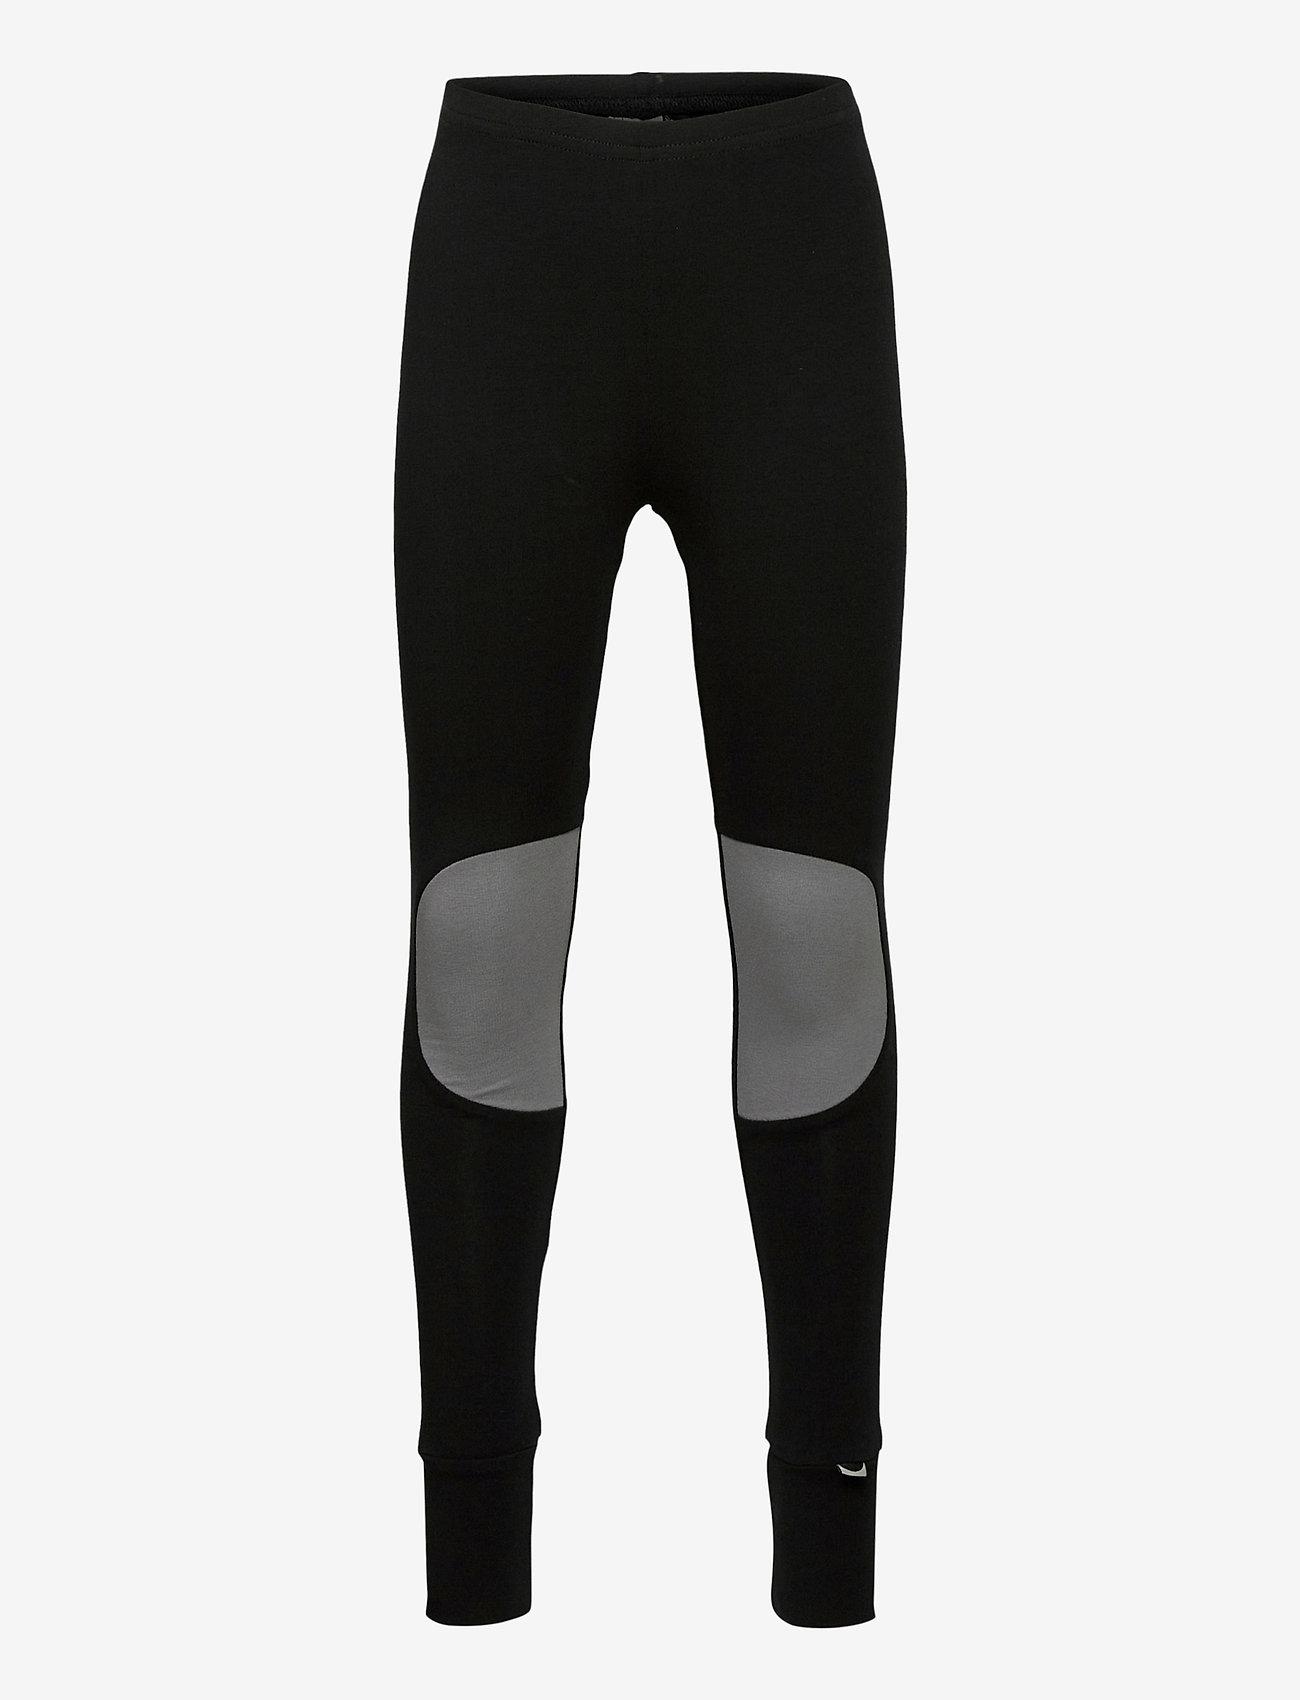 Papu - PATCH LEGGINGS KID - leggings - black, stone grey - 0